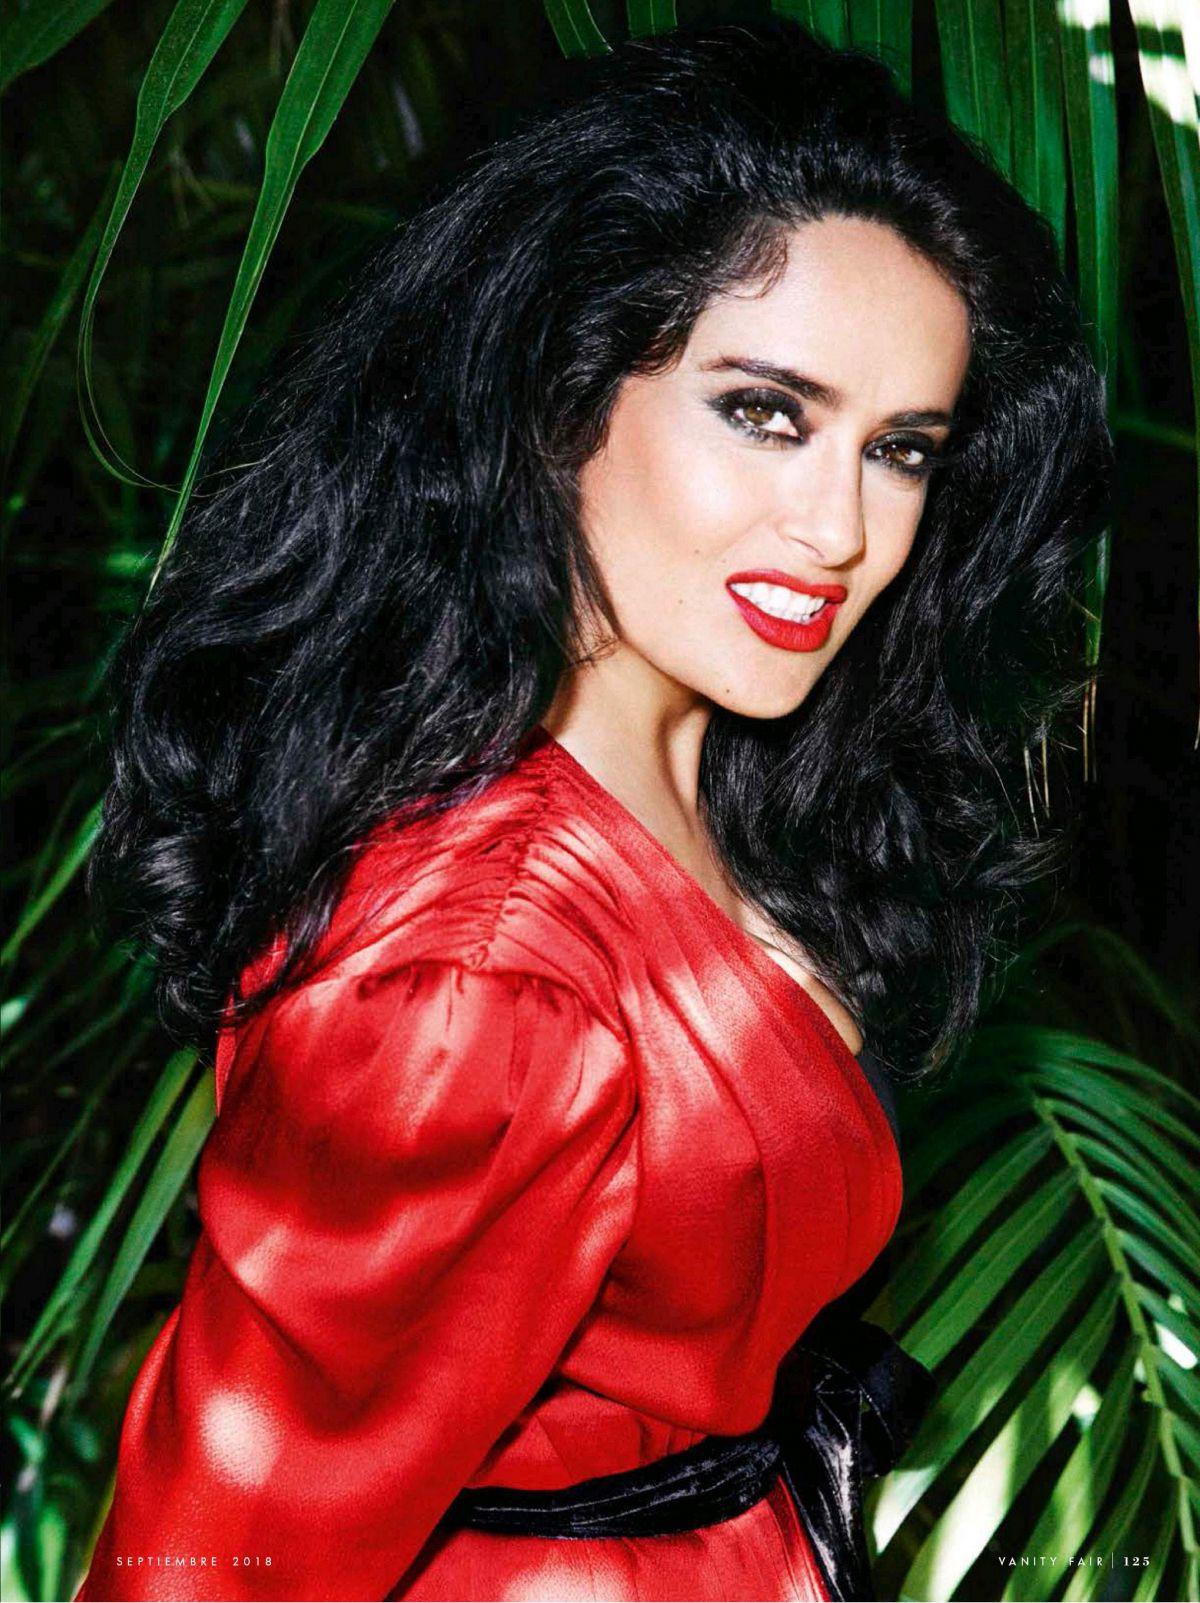 SALMA HAYEK in Vanity Fair Magazine, September 2018 Issue – HawtCelebs